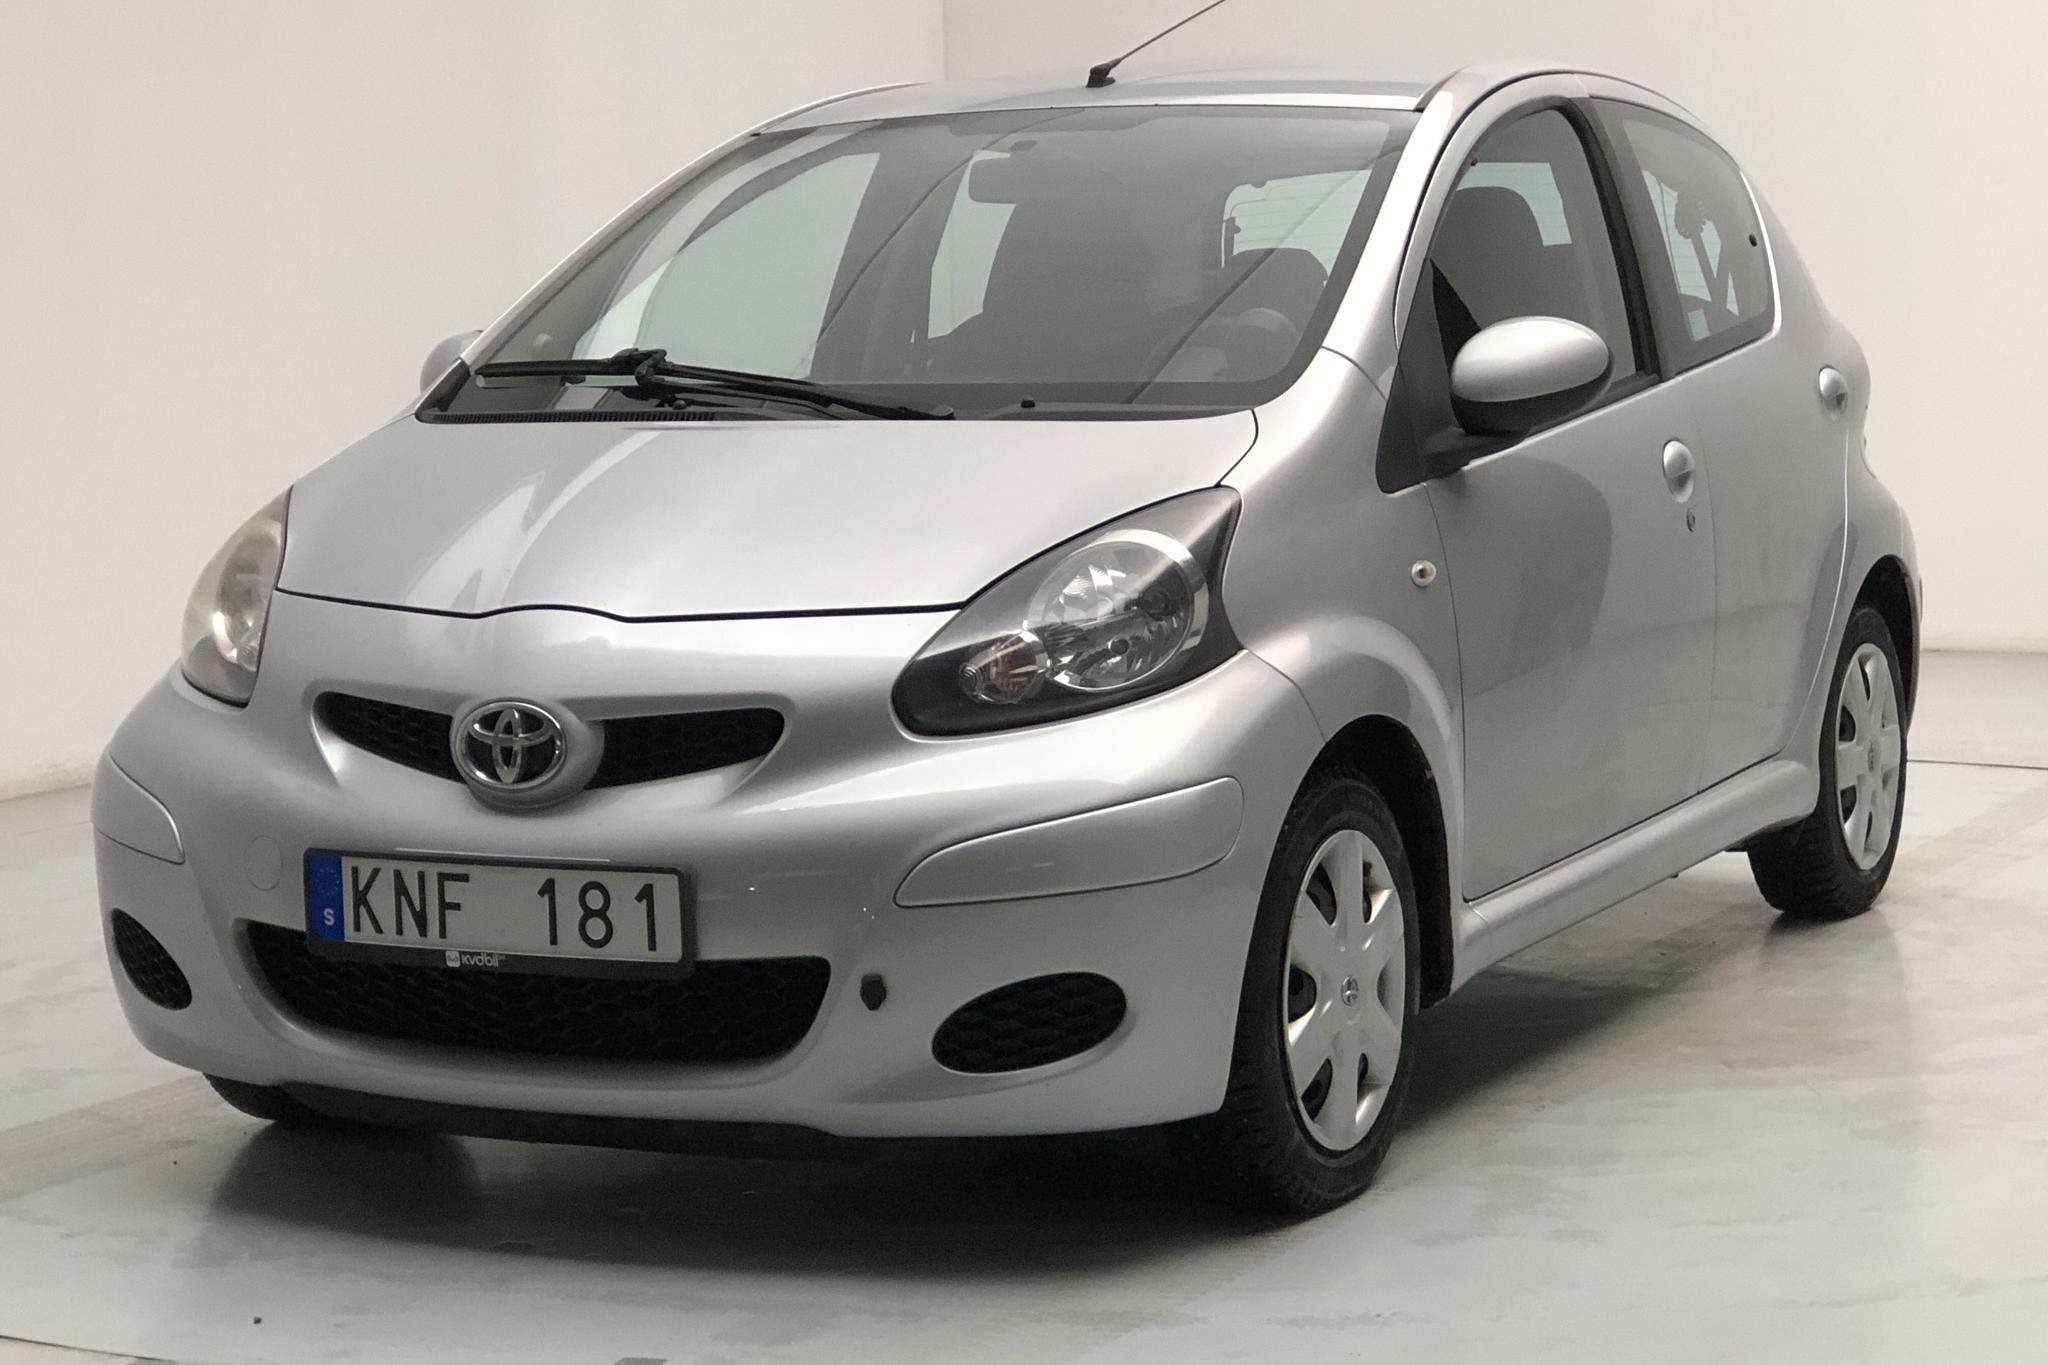 Toyota Aygo 1.0 VVT-i 5dr (68hk) - 8 411 mil - Manuell - silver - 2010